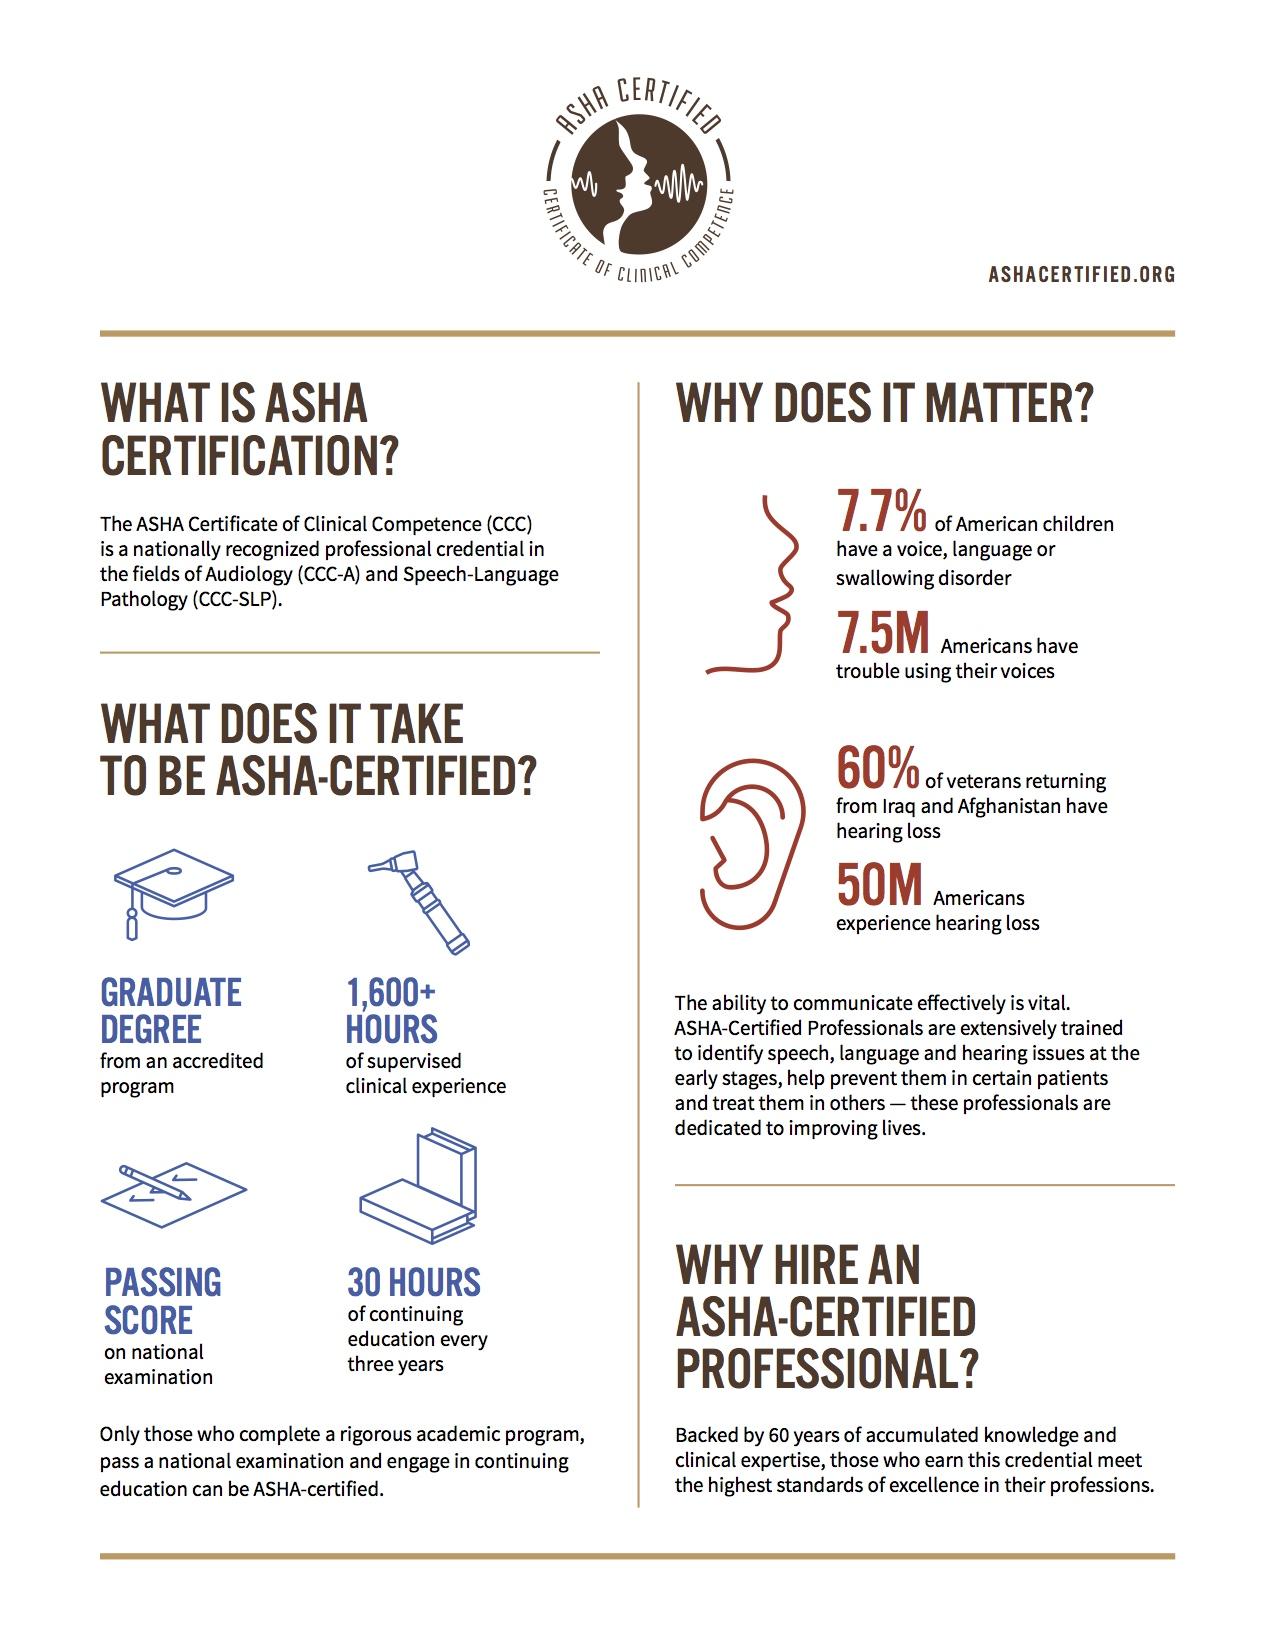 American-Speech-Language-Hearing Association (ASHA)Certification